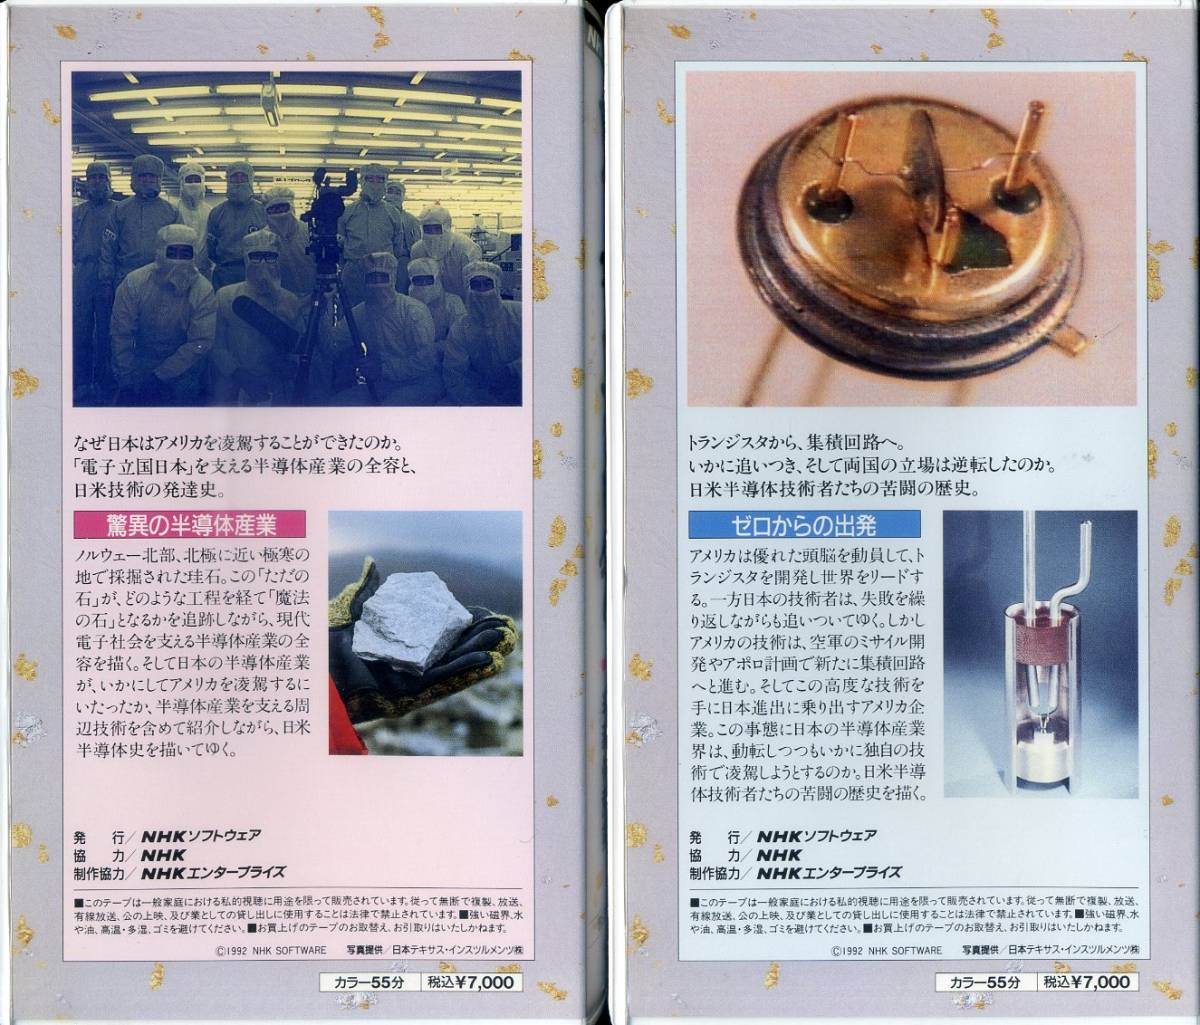 即決〈同梱歓迎〉VHS電子立国日本の自叙伝 全4巻(計4本揃) NHKビデオ◎その他多数出品中∞3167_画像5